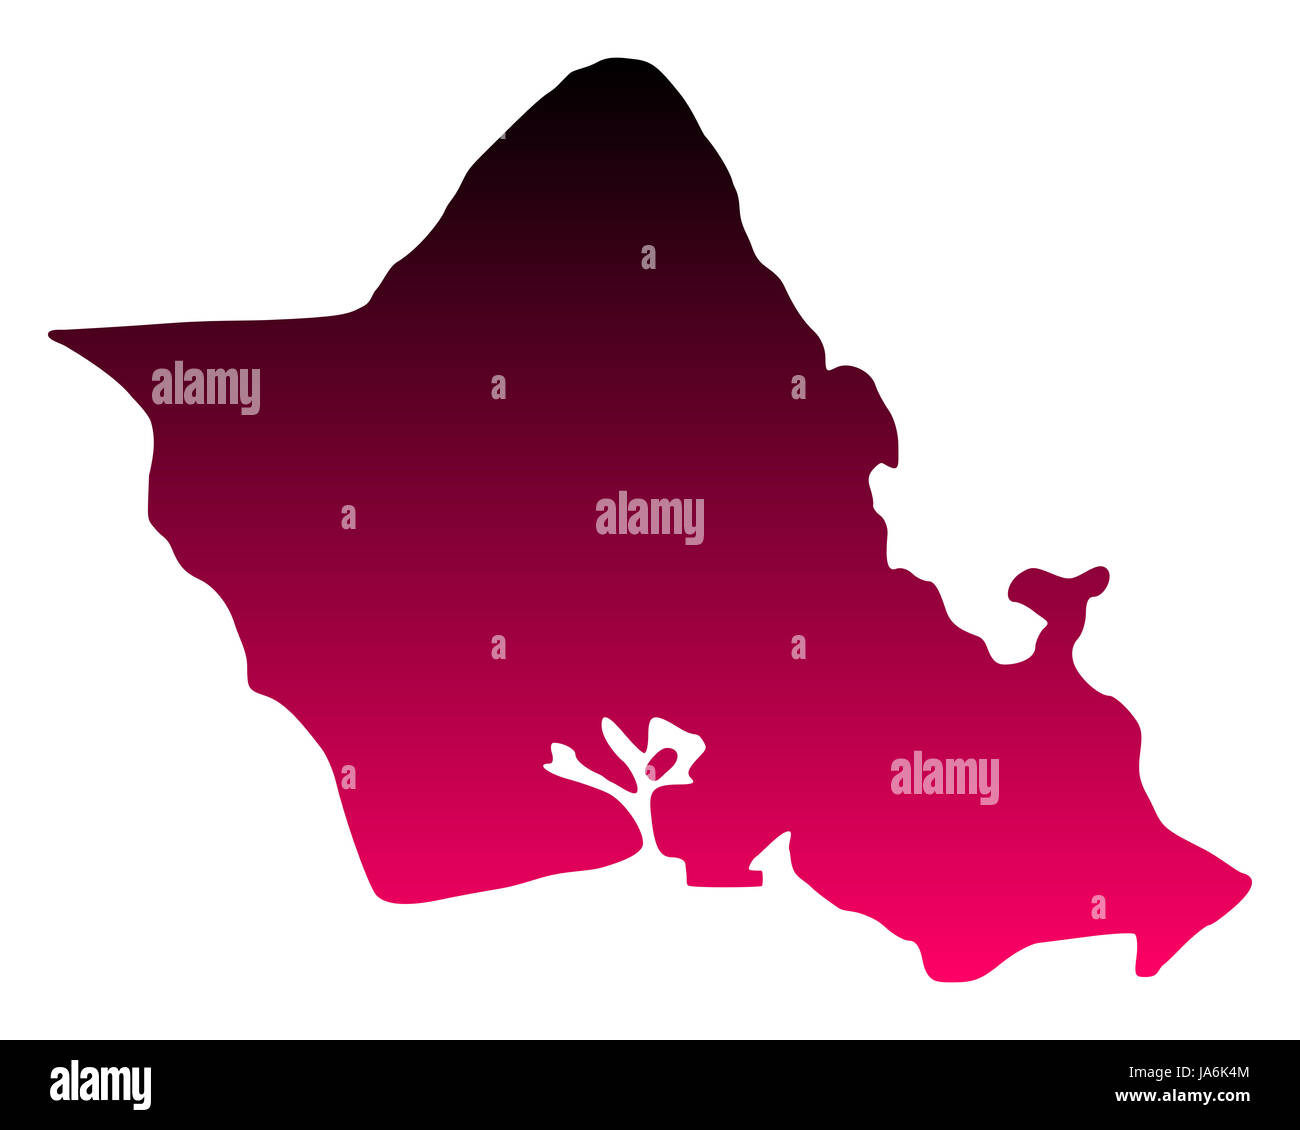 Karte von Oahu - Stock Image